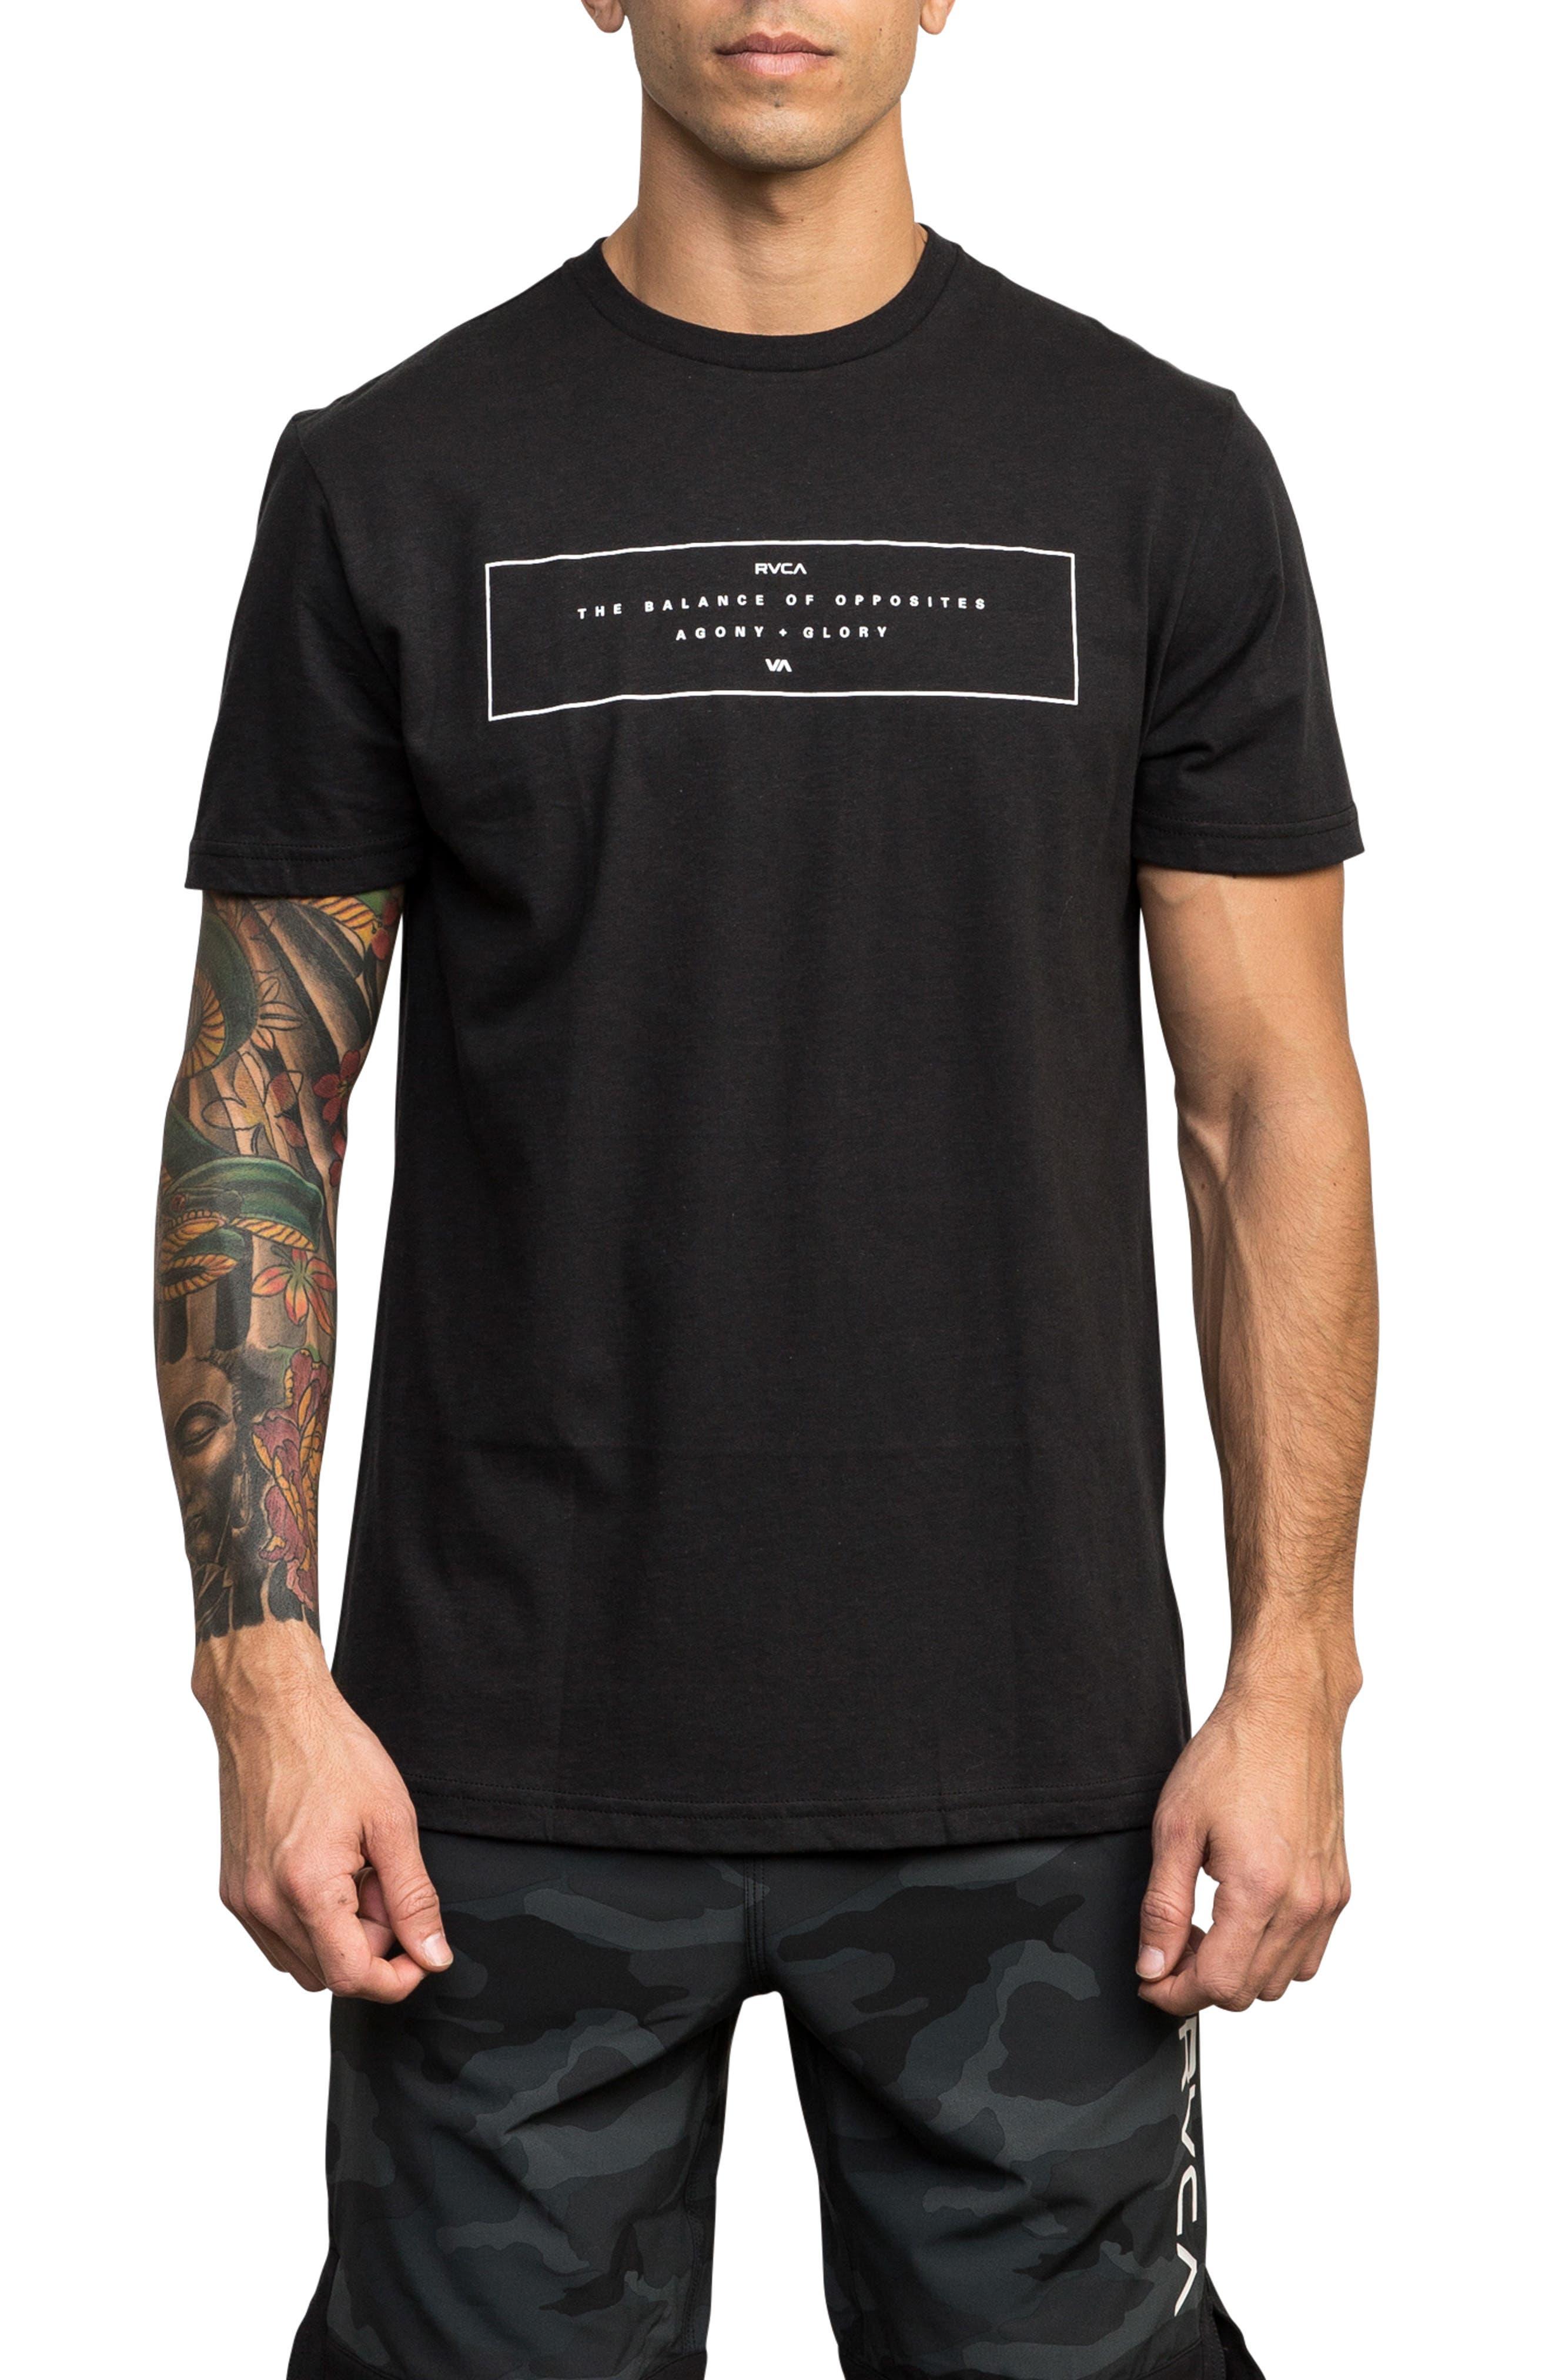 Rvca Sports Bar Graphic T-Shirt, Black